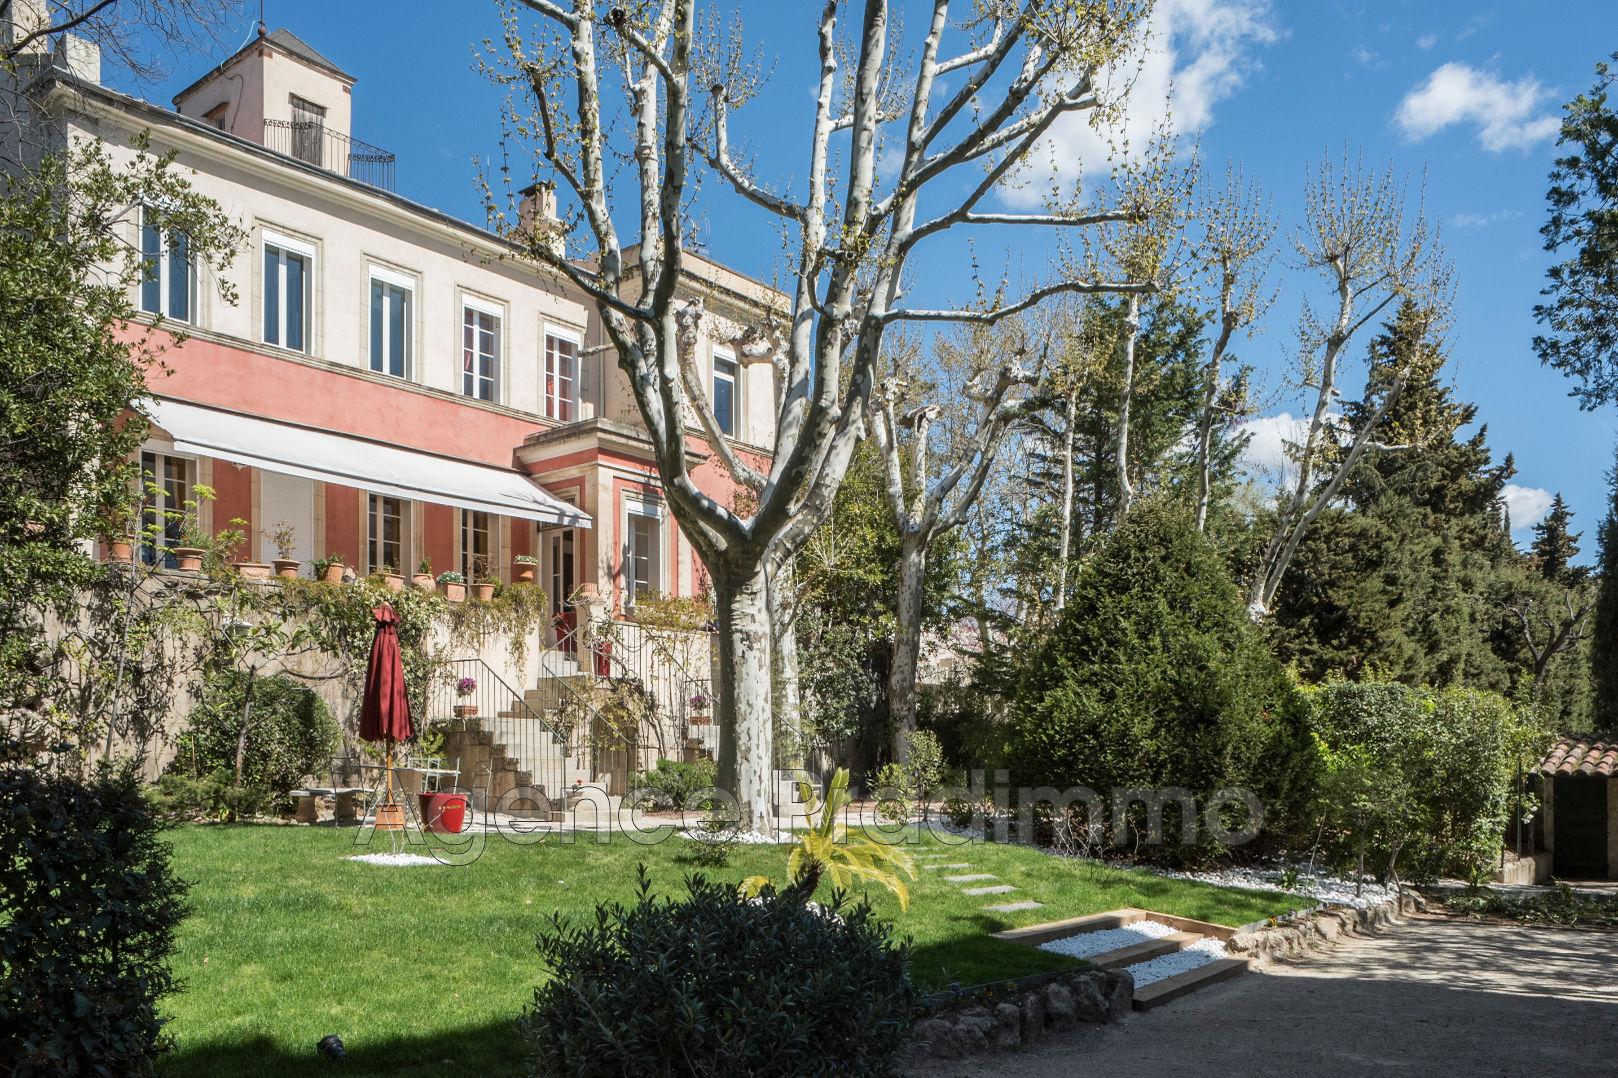 Maisons villas propos par agence pradimmo marseille for Calcul chauffage piscine